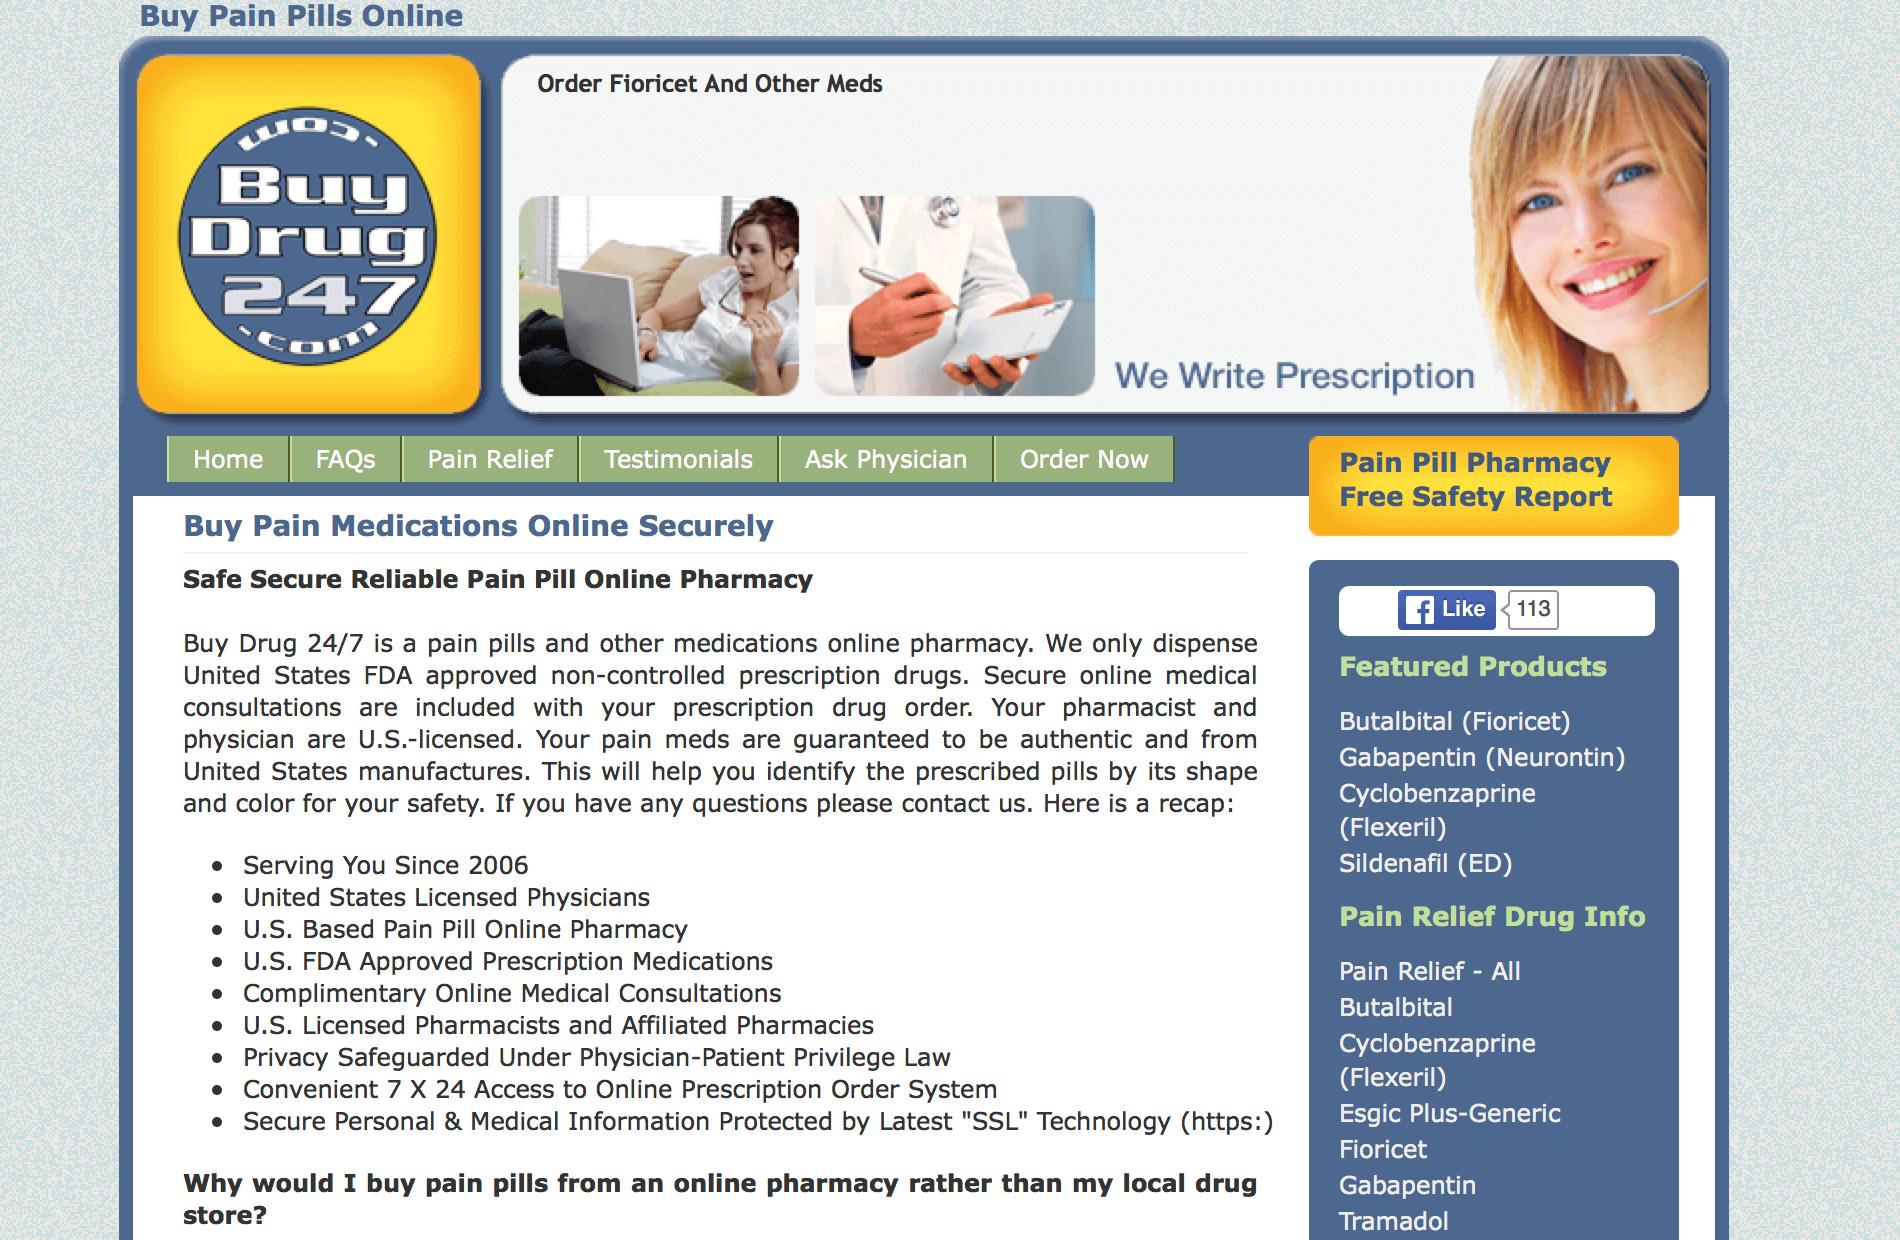 BuyDrug247.com Pharmacy Review